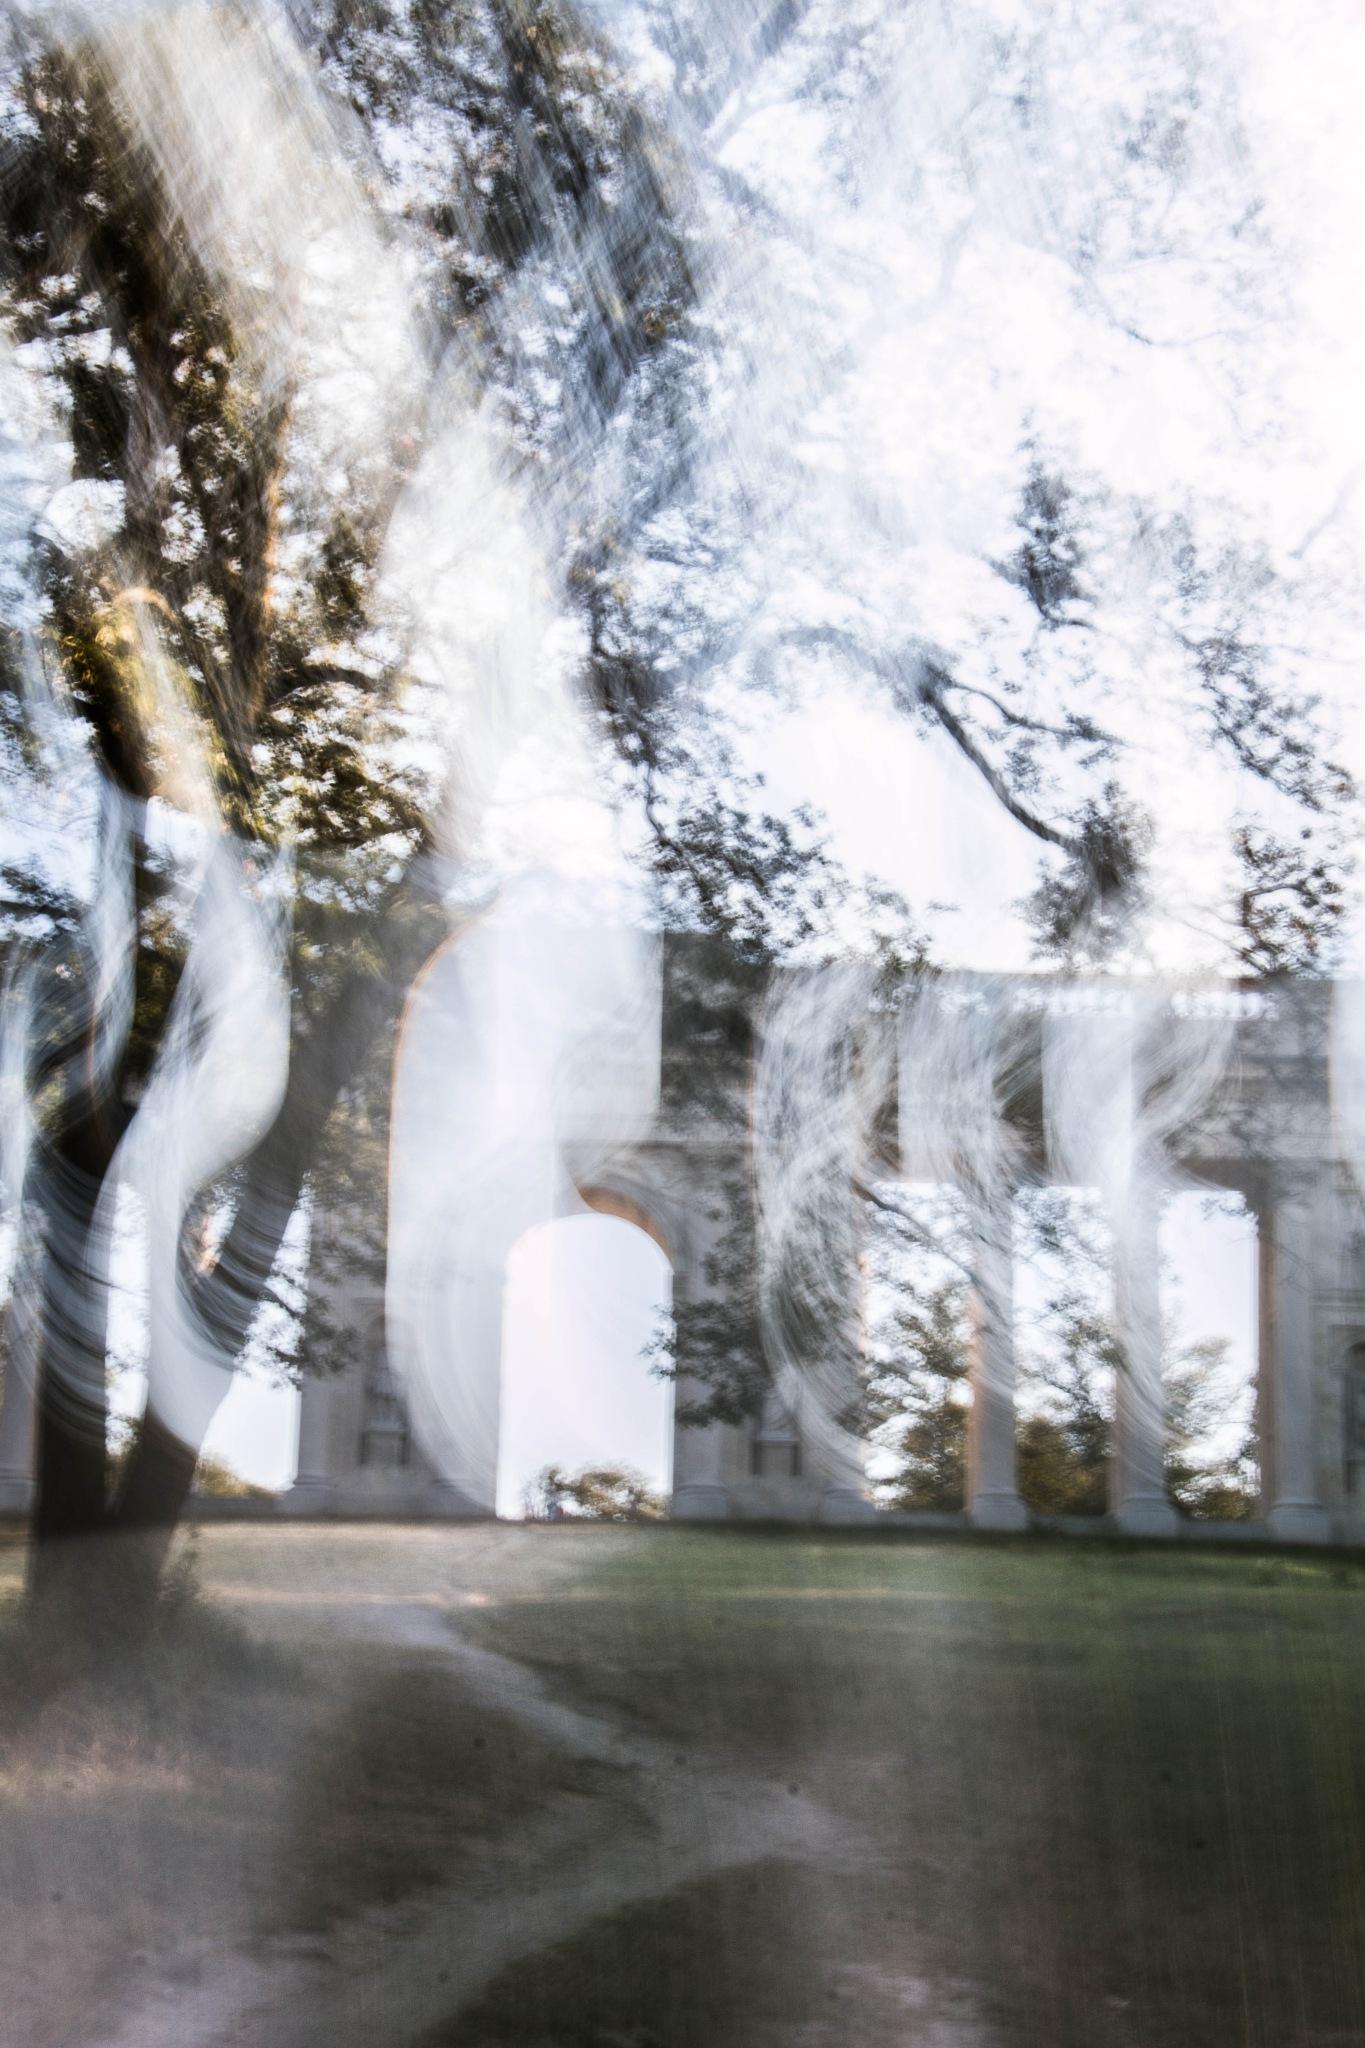 Collonade by Zuzana Ludvikova